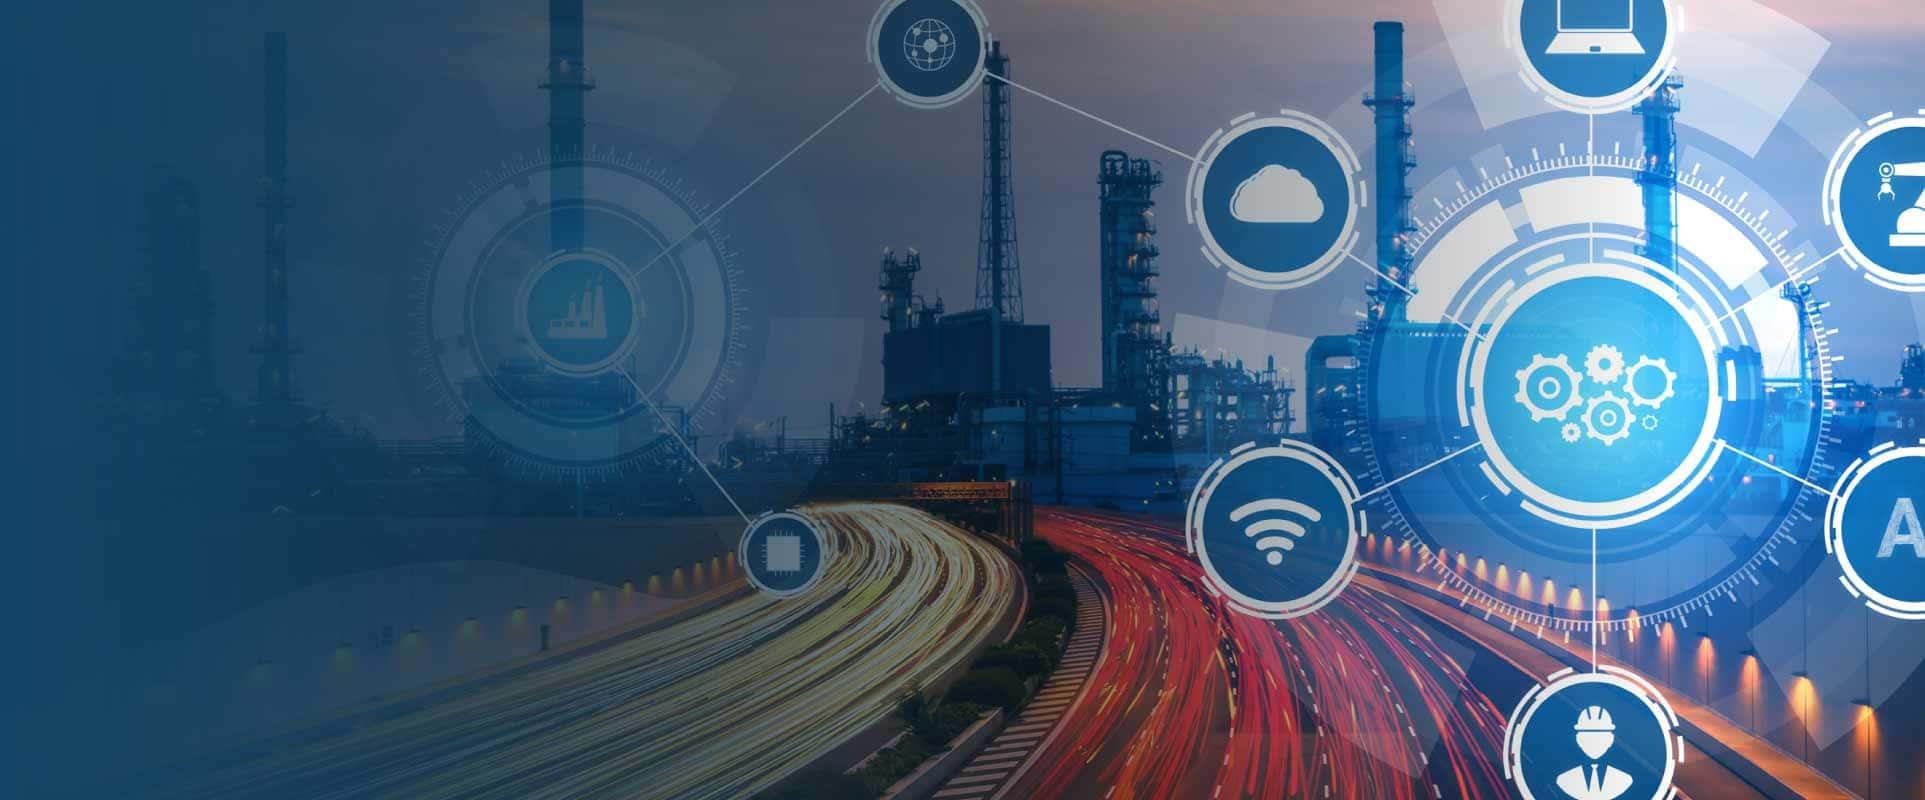 PTC and Birlasoft Re-Imagine Digital Transformation